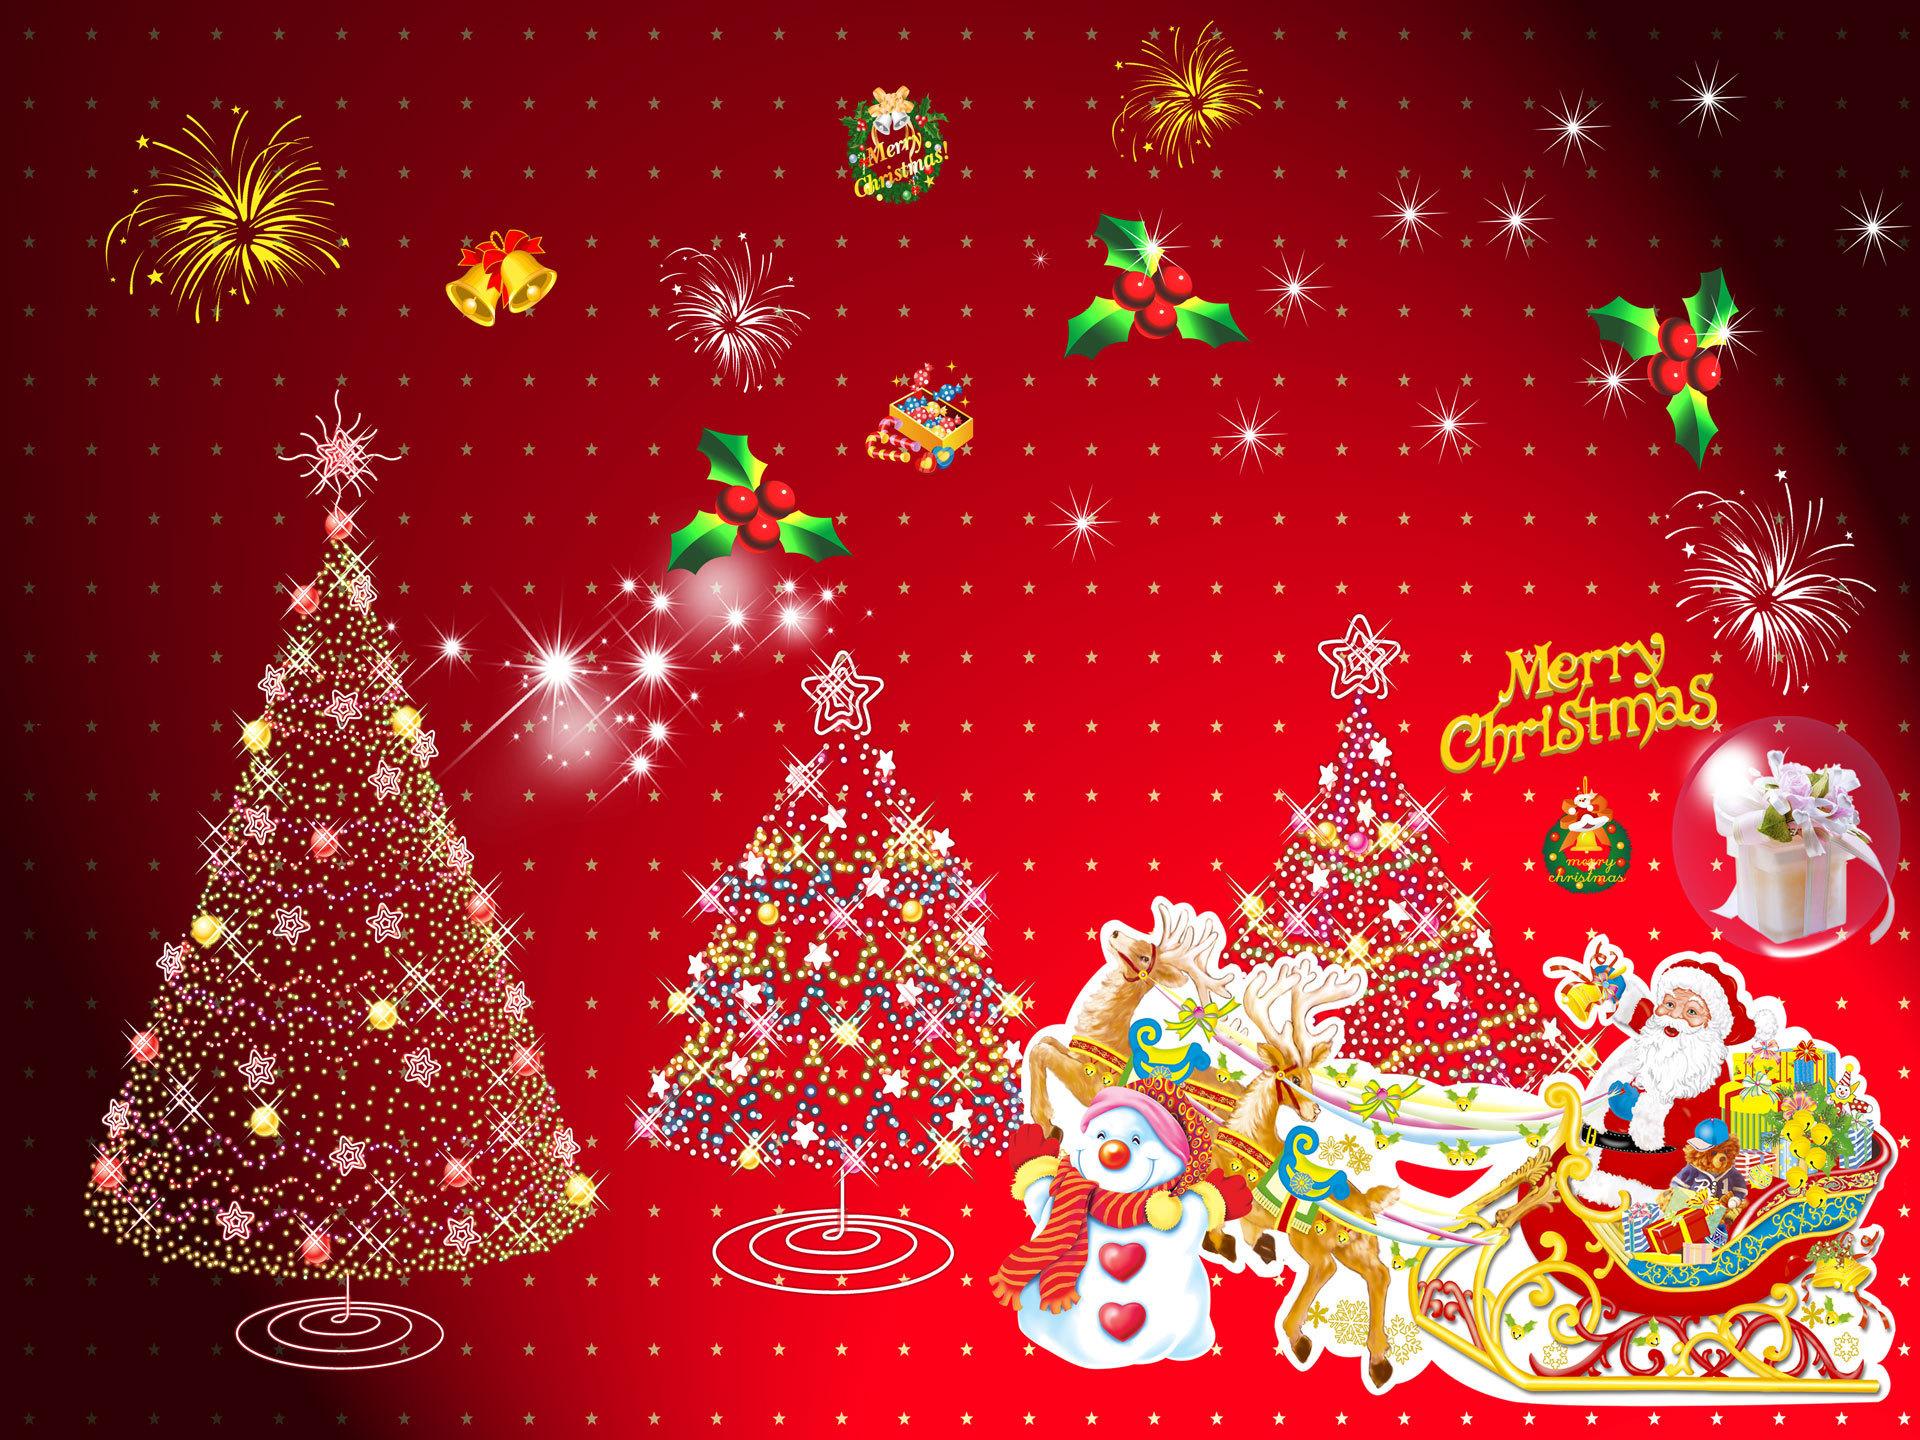 Santa Claus christmas 16092485 1920 1440